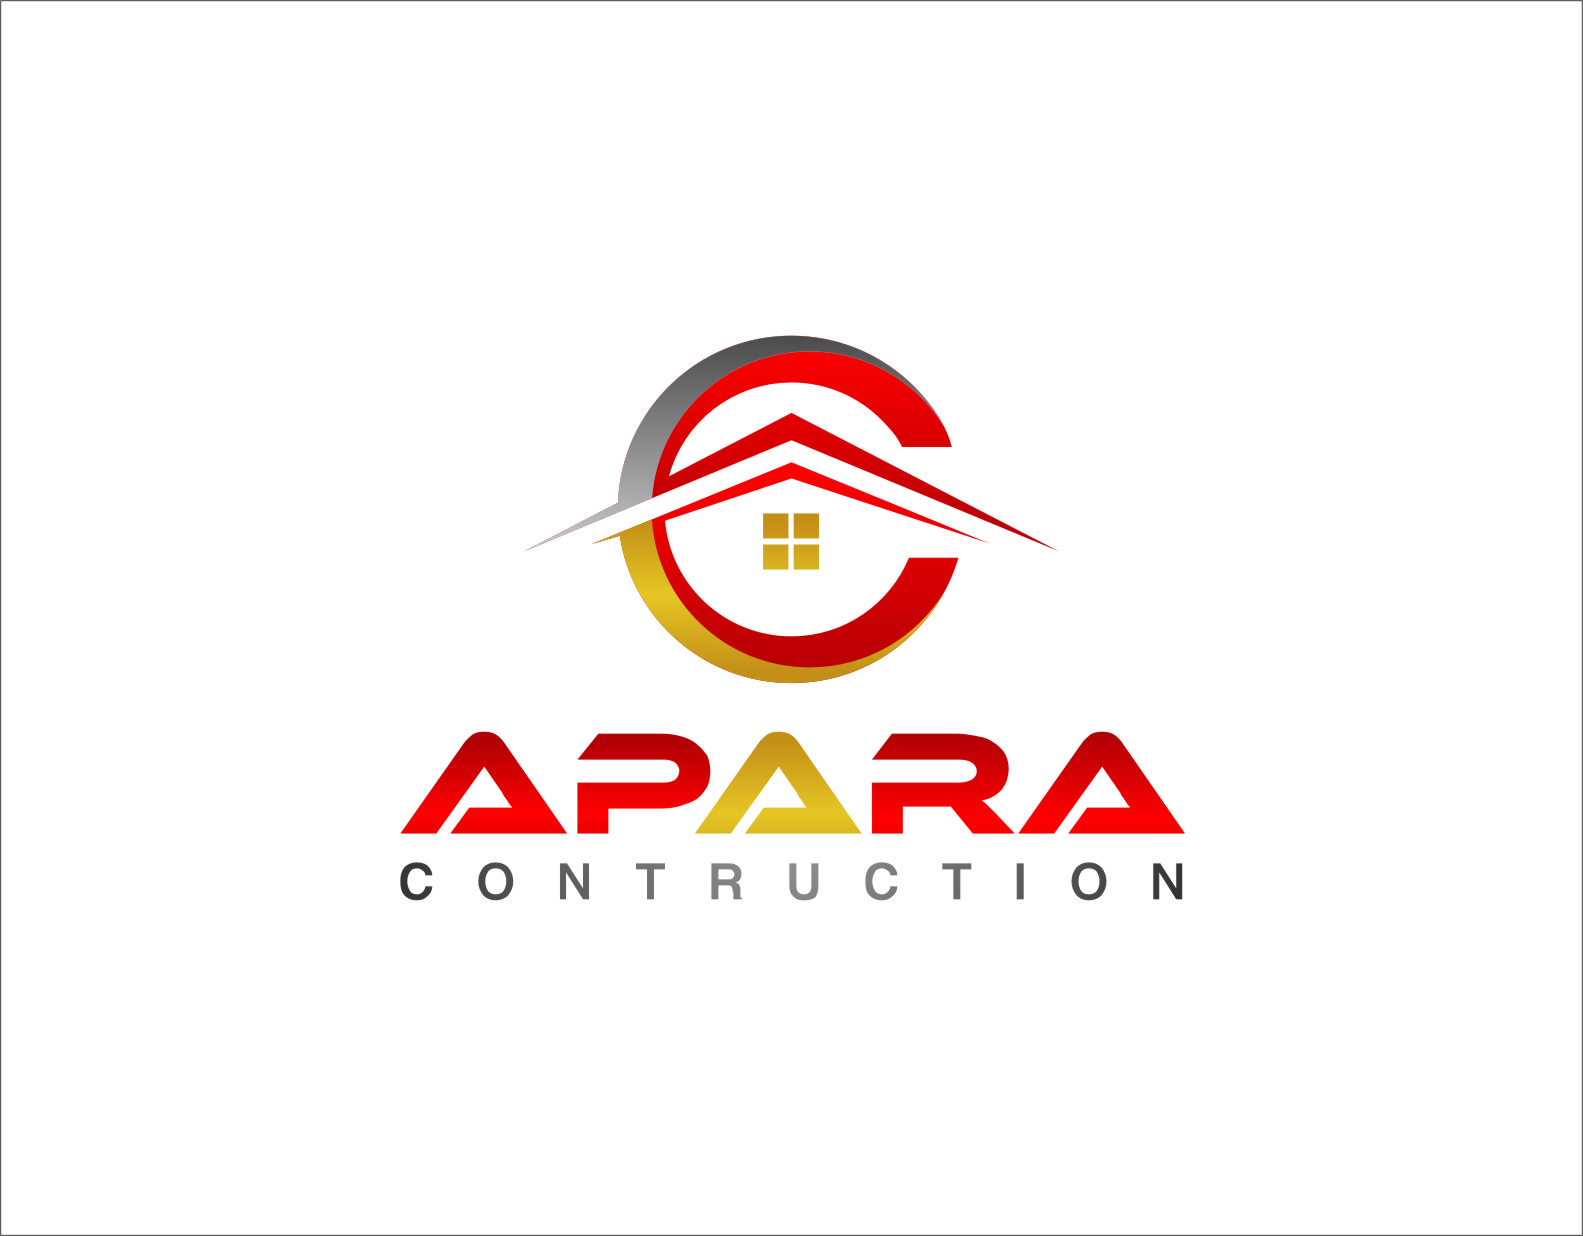 Logo Design by Ngepet_art - Entry No. 21 in the Logo Design Contest Apara Construction Logo Design.